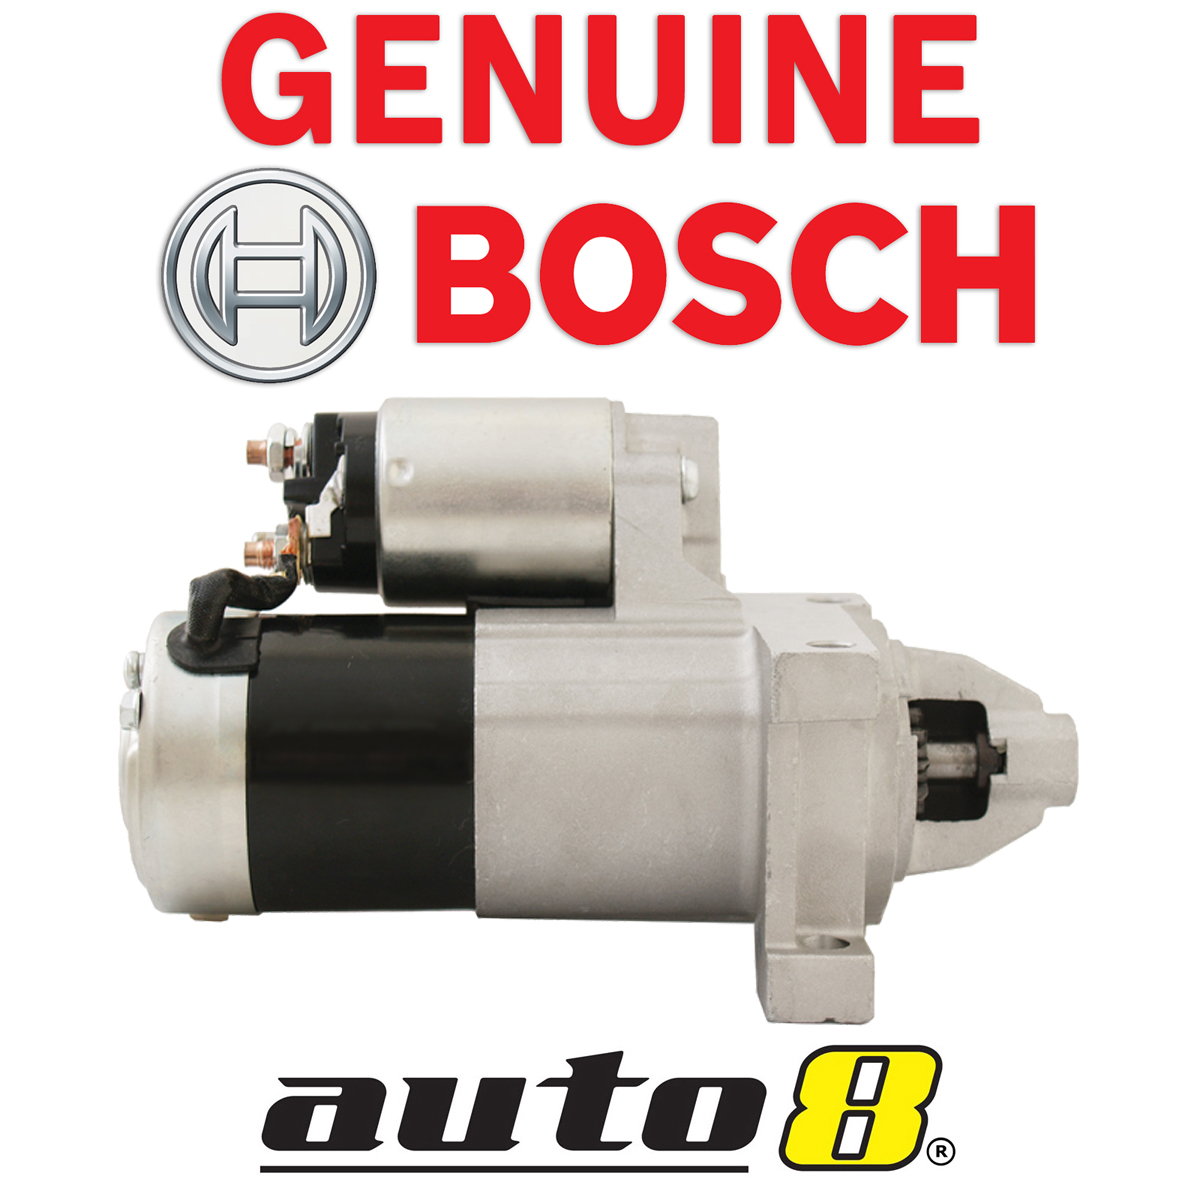 Genuine bosch starter motor for holden commodore 57l v8 ls1 vt item specifics vanachro Gallery